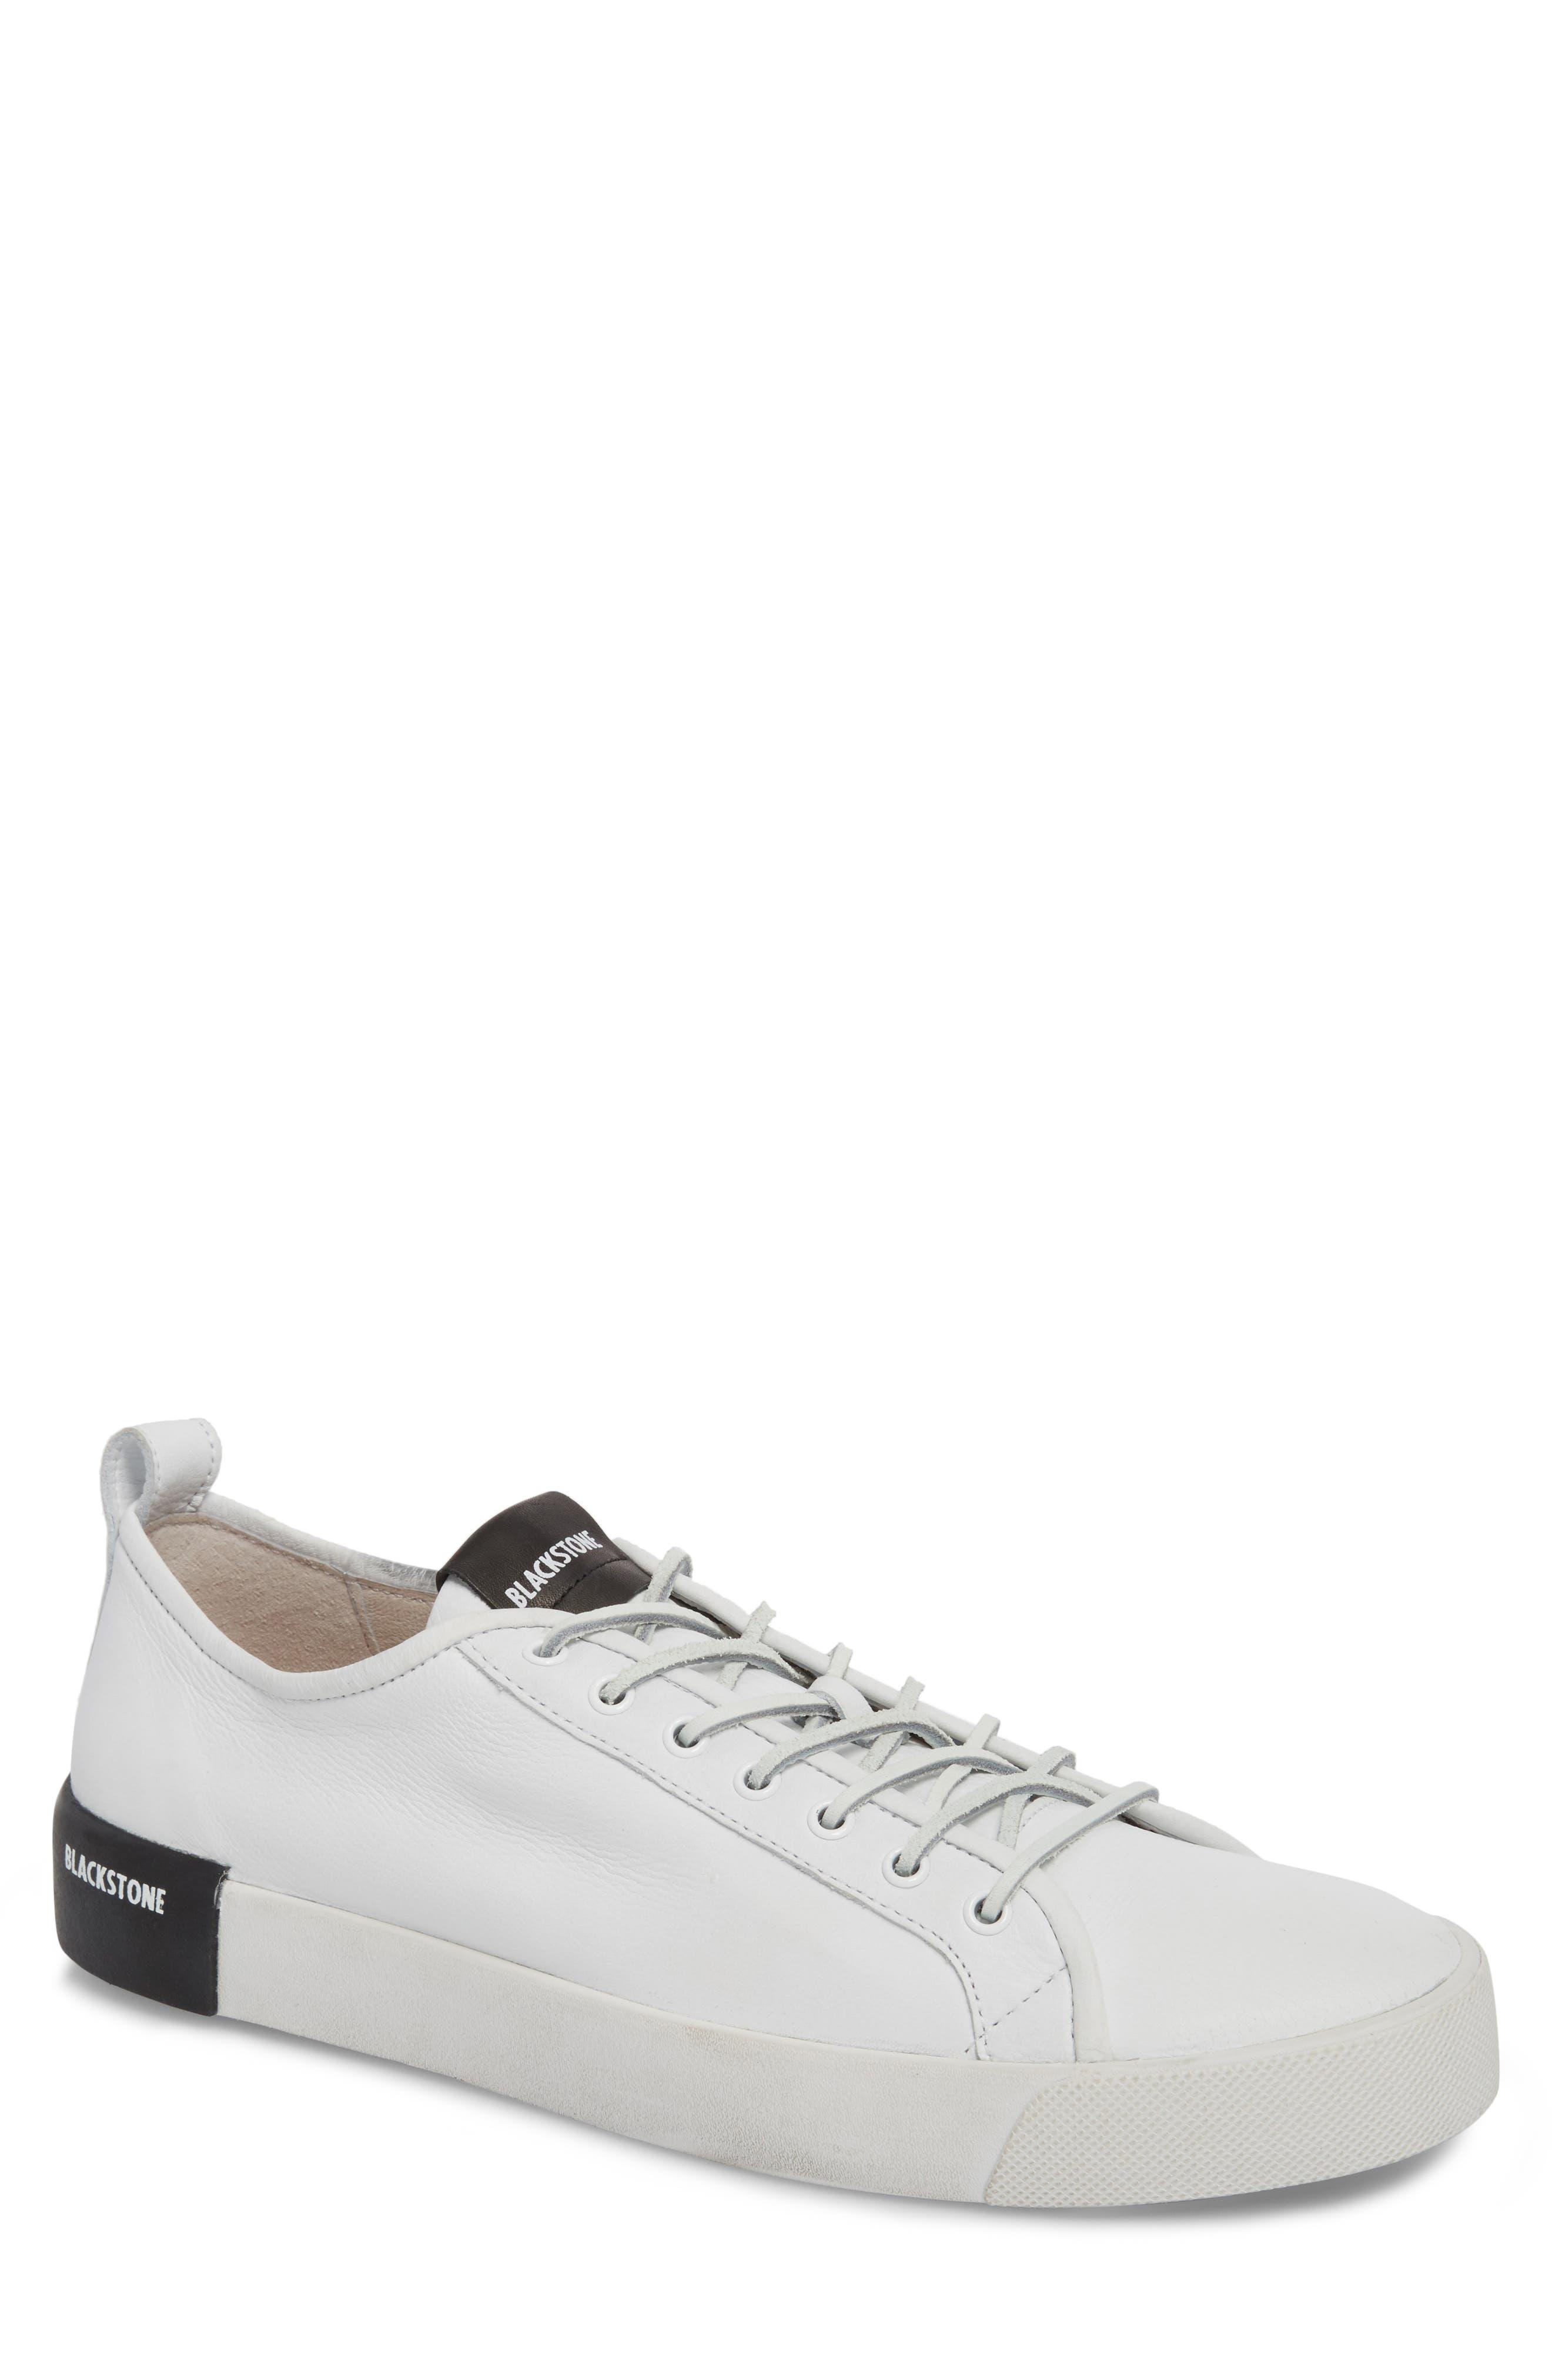 Blackstone PM66 Low Top Sneaker (Men)